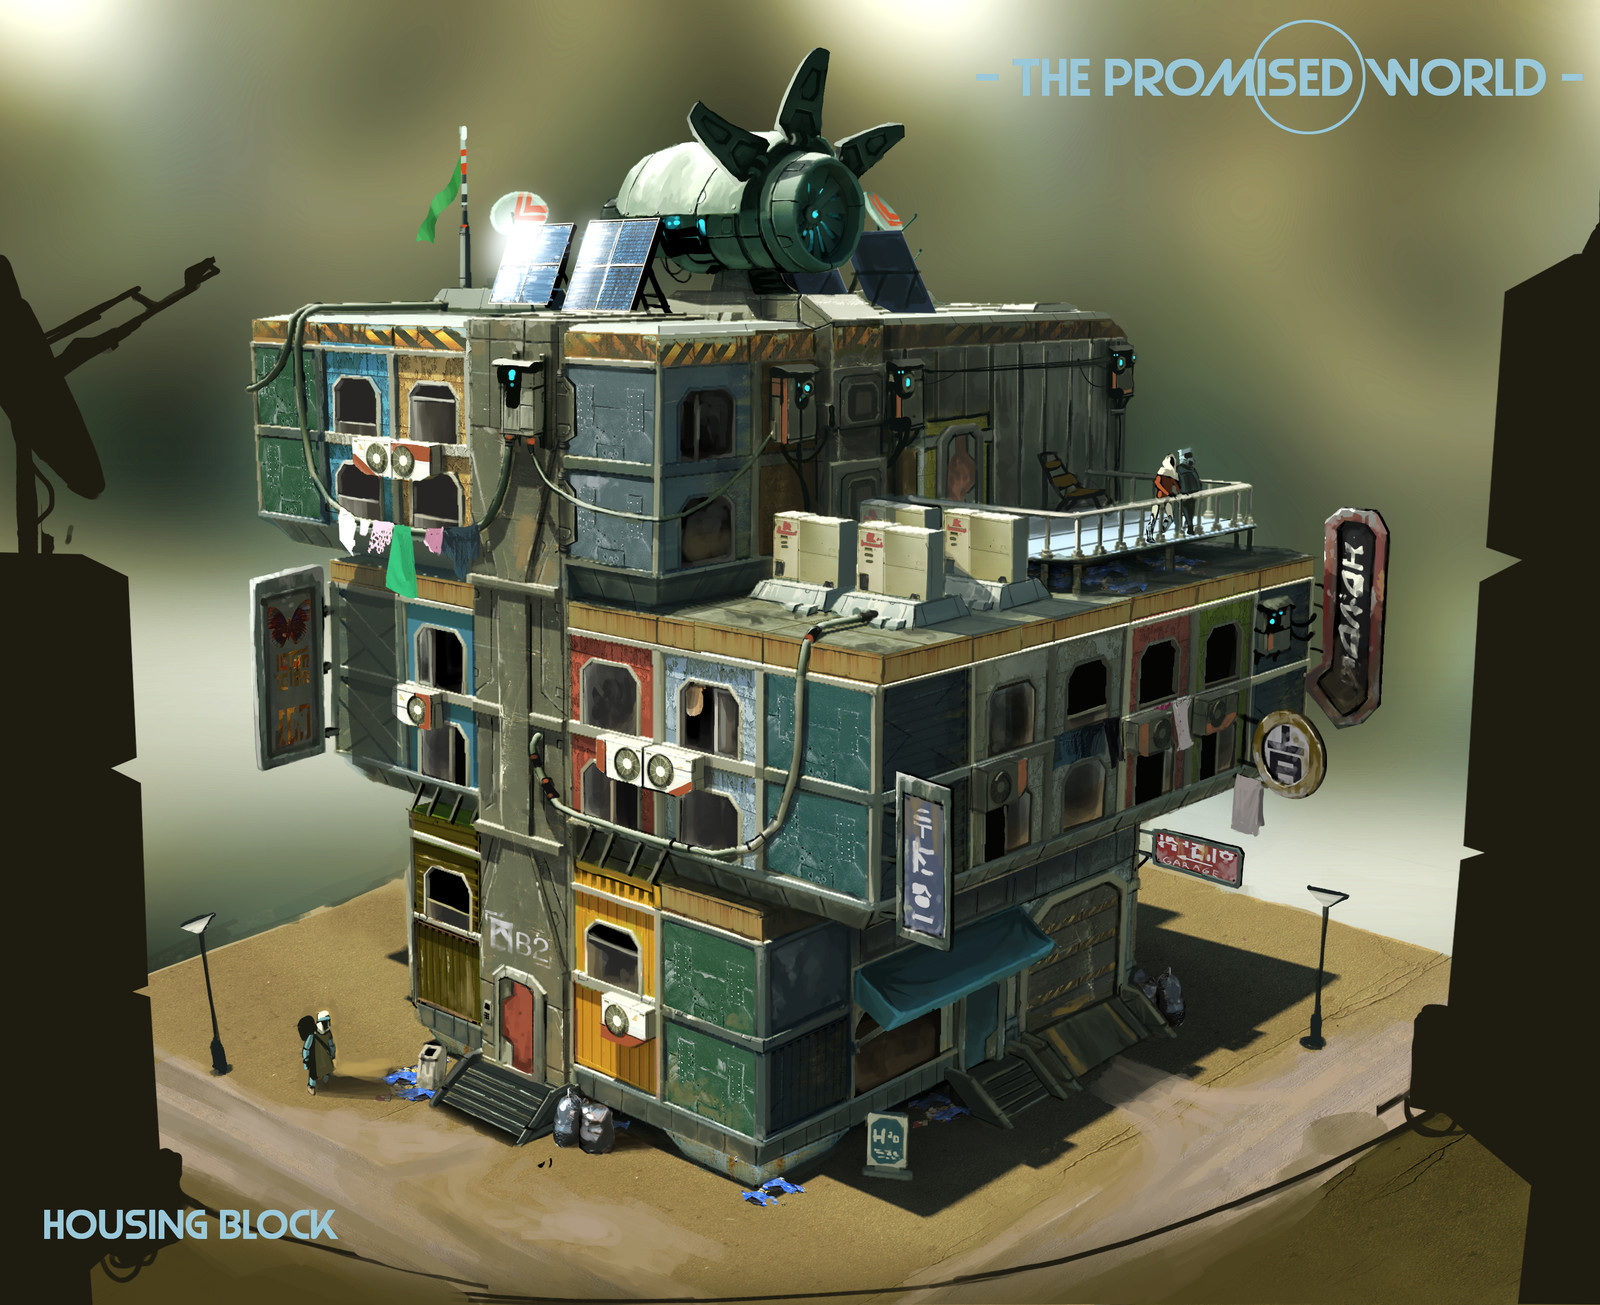 Colony housing block concept